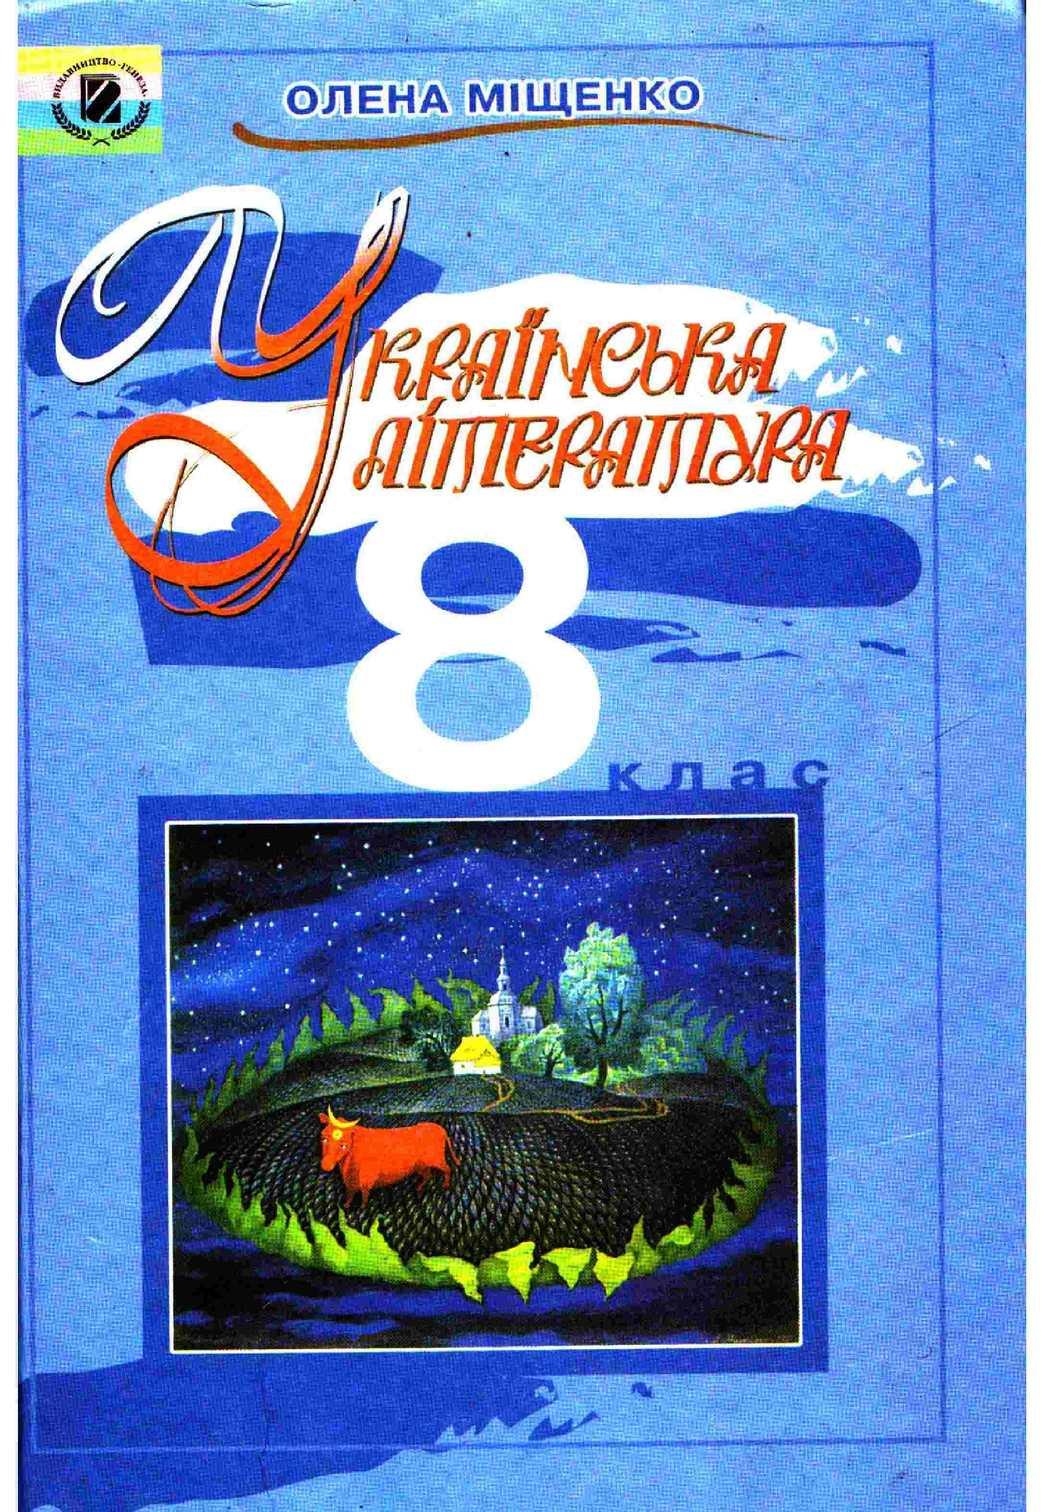 Calaméo - Ukrliteratura Mishhenko 8klas 0247f8eb4af88